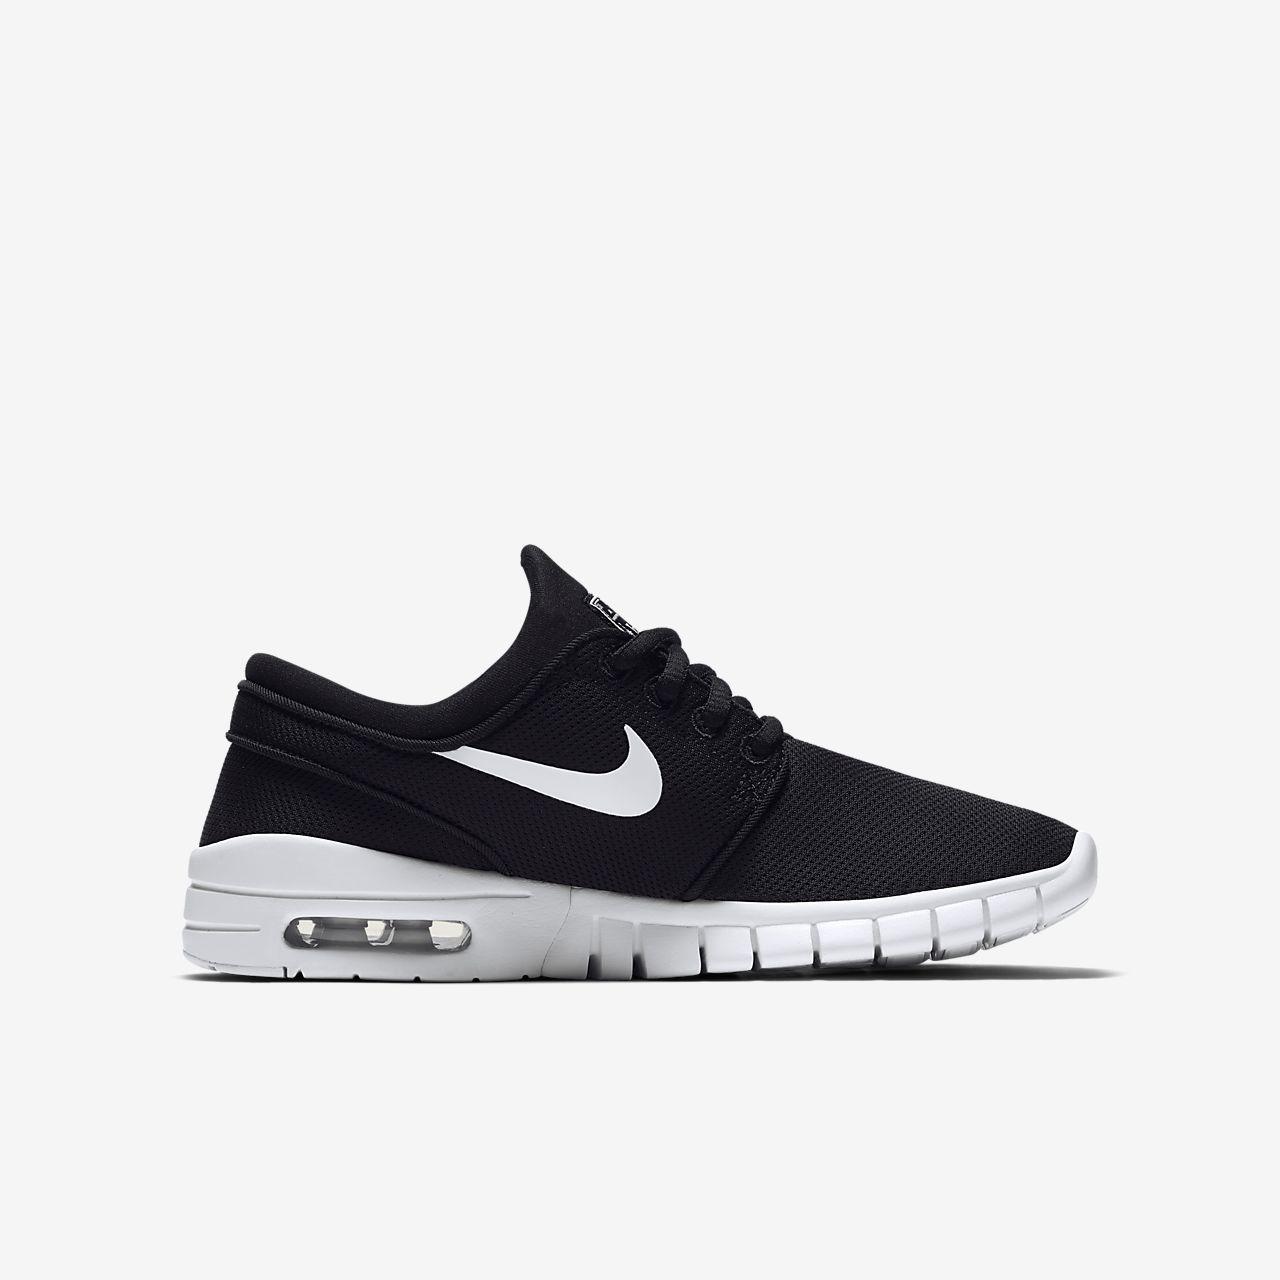 reputable site a4f3e 0e143 Nike SB Stefan Janoski Max Chaussure - sequoia black